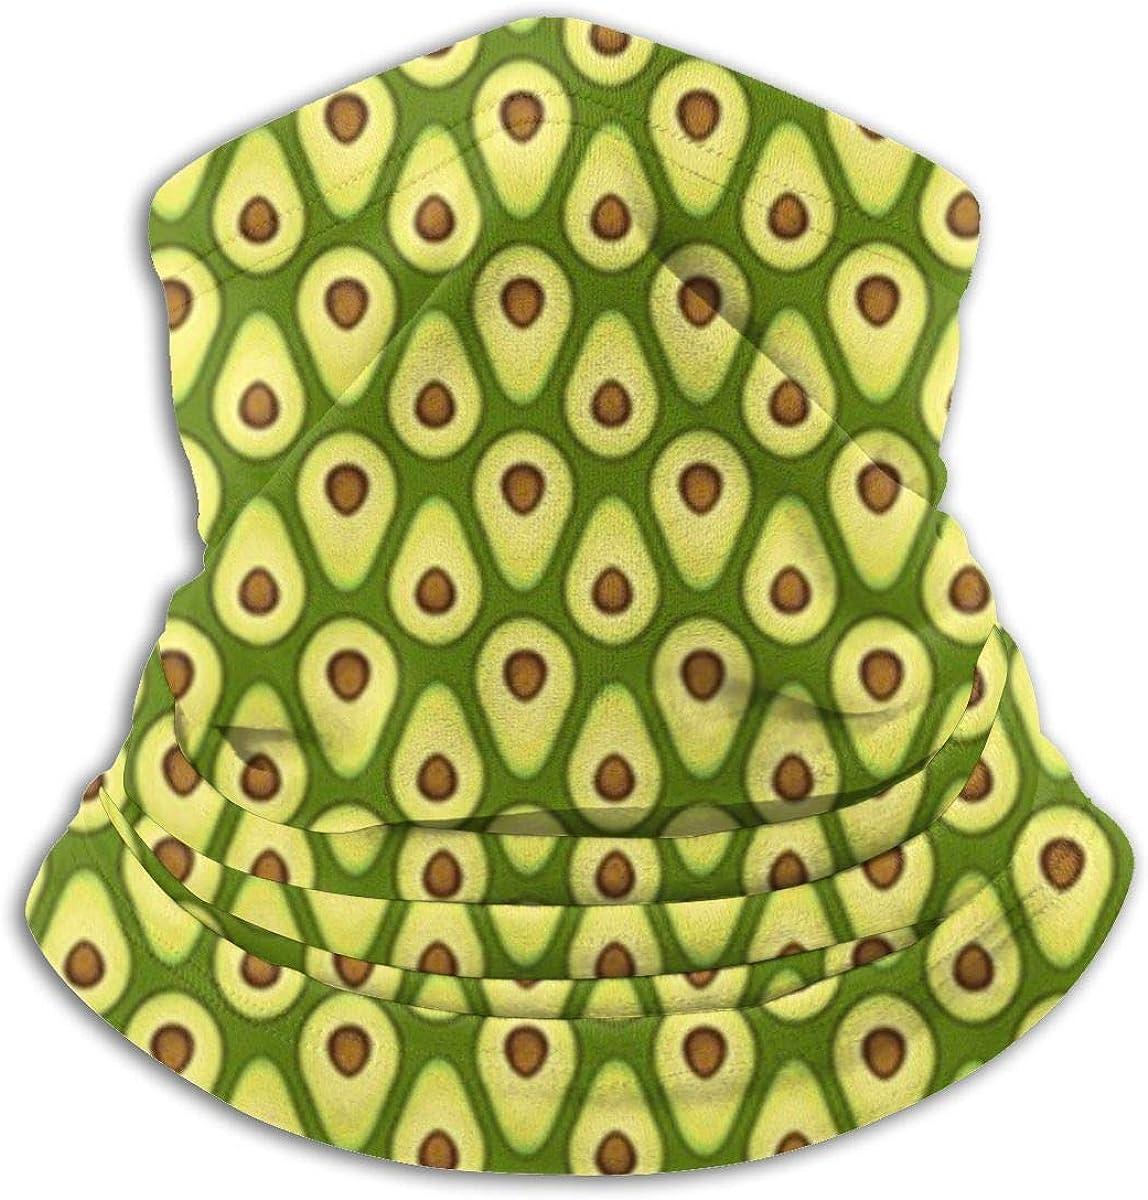 Microfiber Neck Warmer Eat The Avocado Neck Gaiter Tube Ear Warmer Headband Scarf Face Mask Balaclava Black